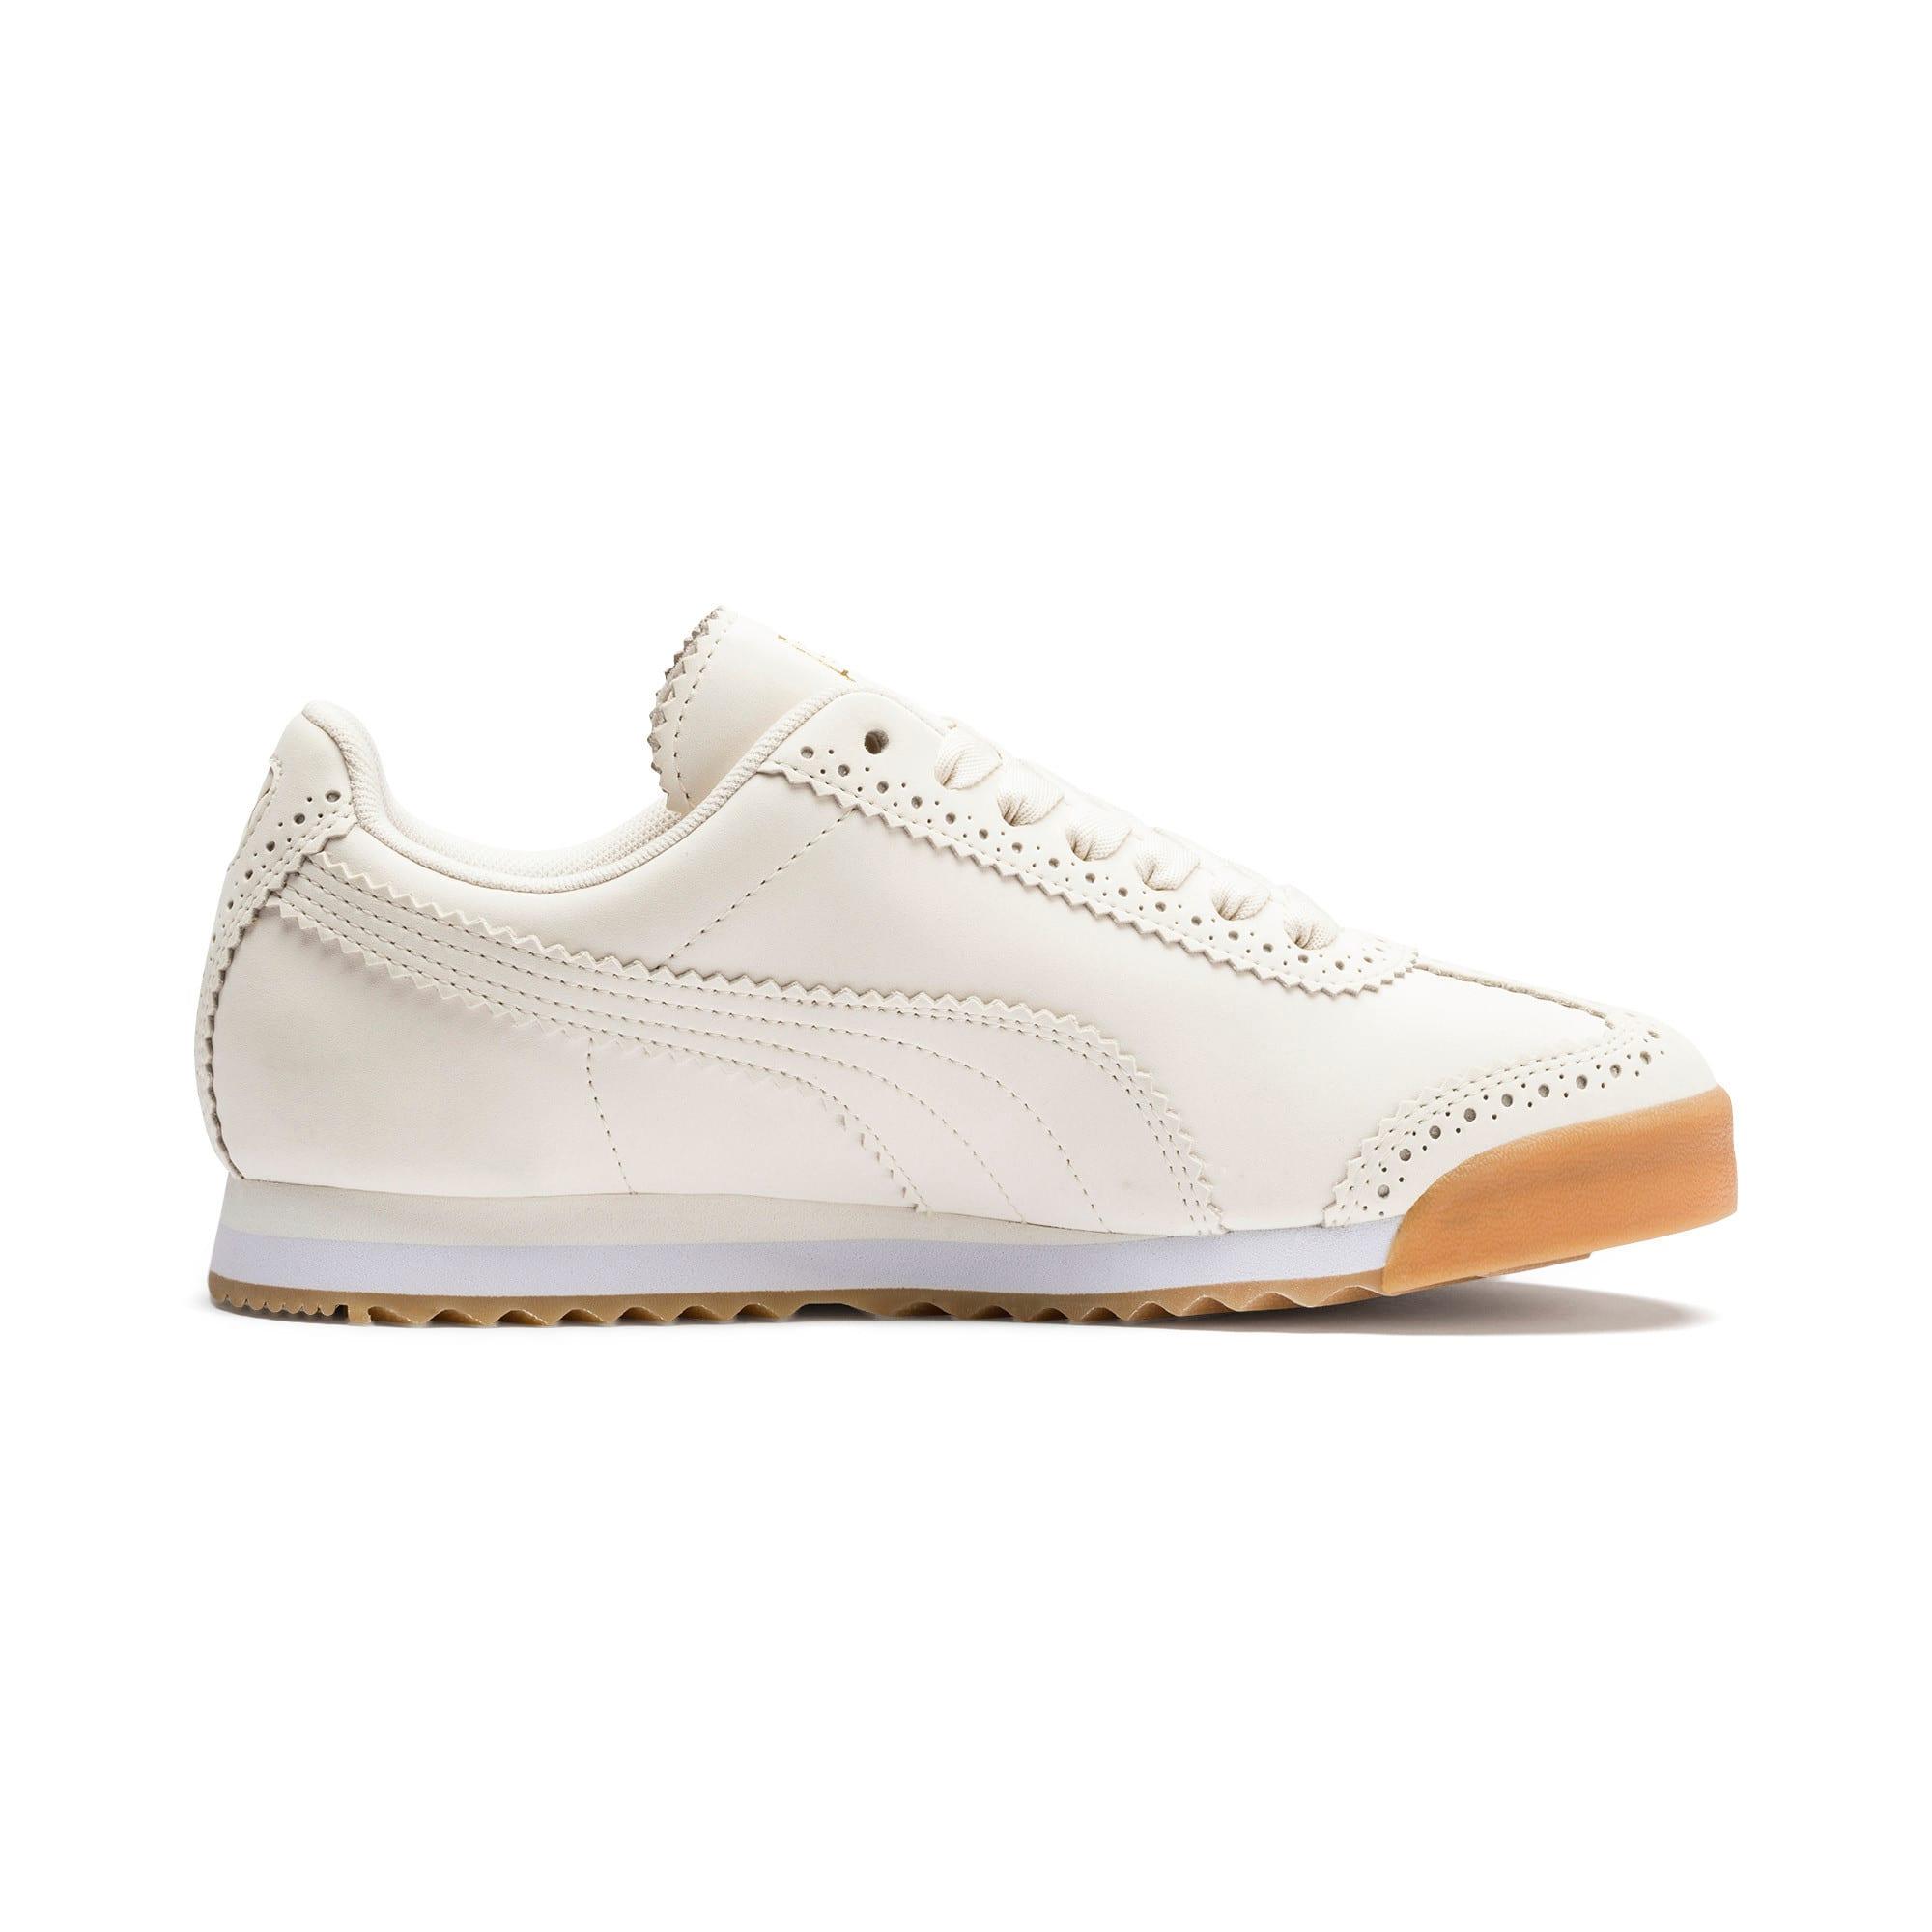 Thumbnail 6 of Roma Brogue Women's Sneakers, Pastel Parchment-P.Team Gold, medium